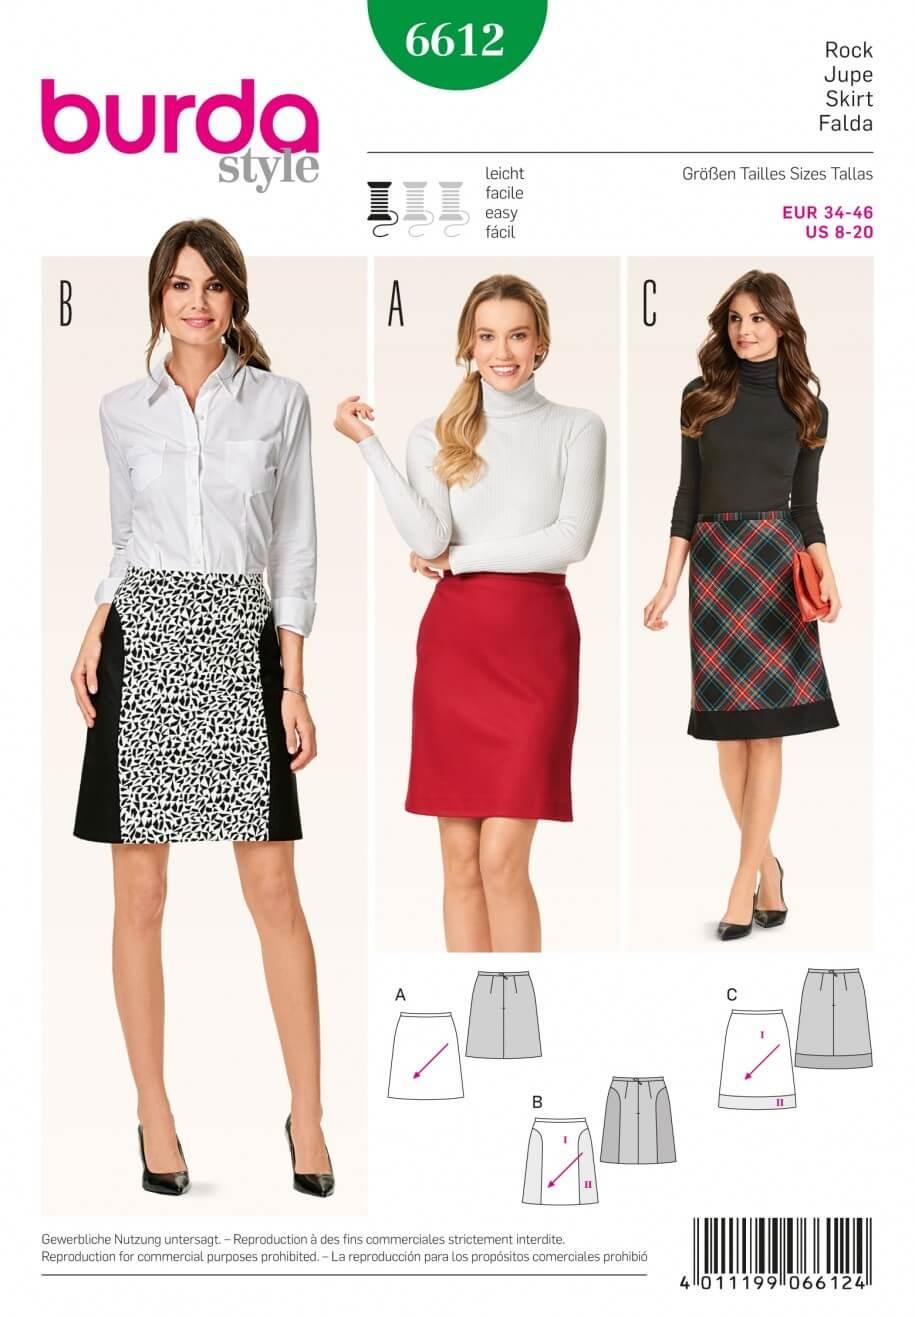 Burda Style Flared Skirt Check Plaid Dress Sewing Pattern 6612